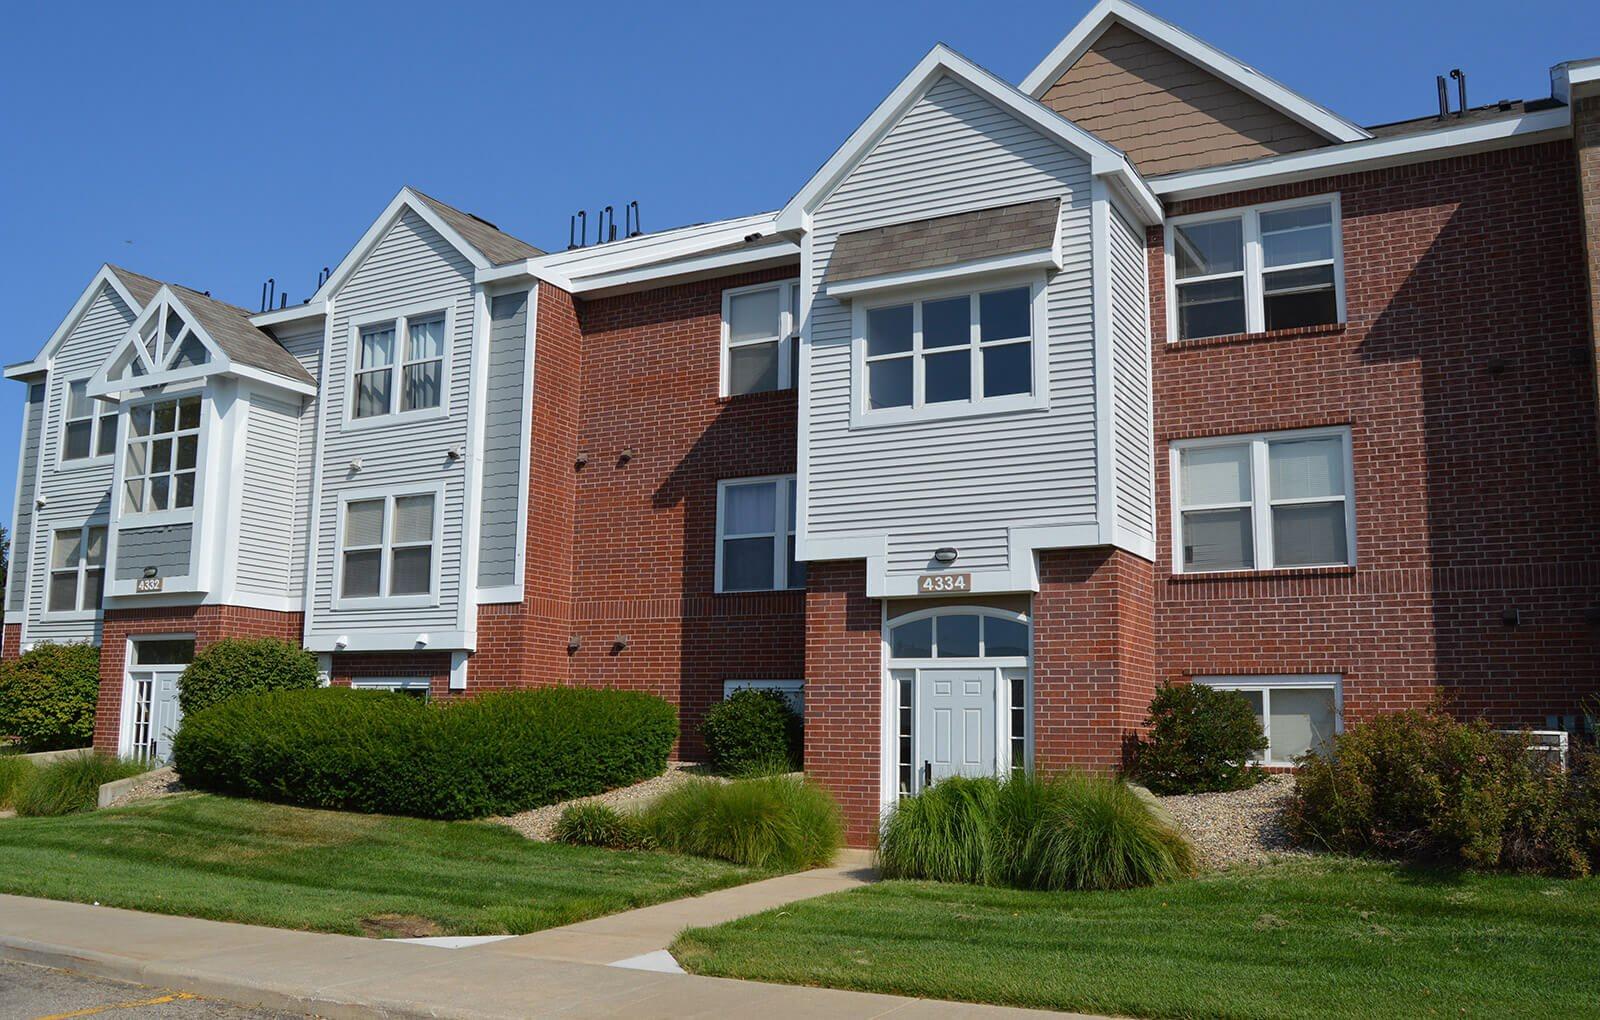 Exterior View of Apartments at Gull Prairie/Gull Run Apartments and Townhomes, Kalamazoo, 49048